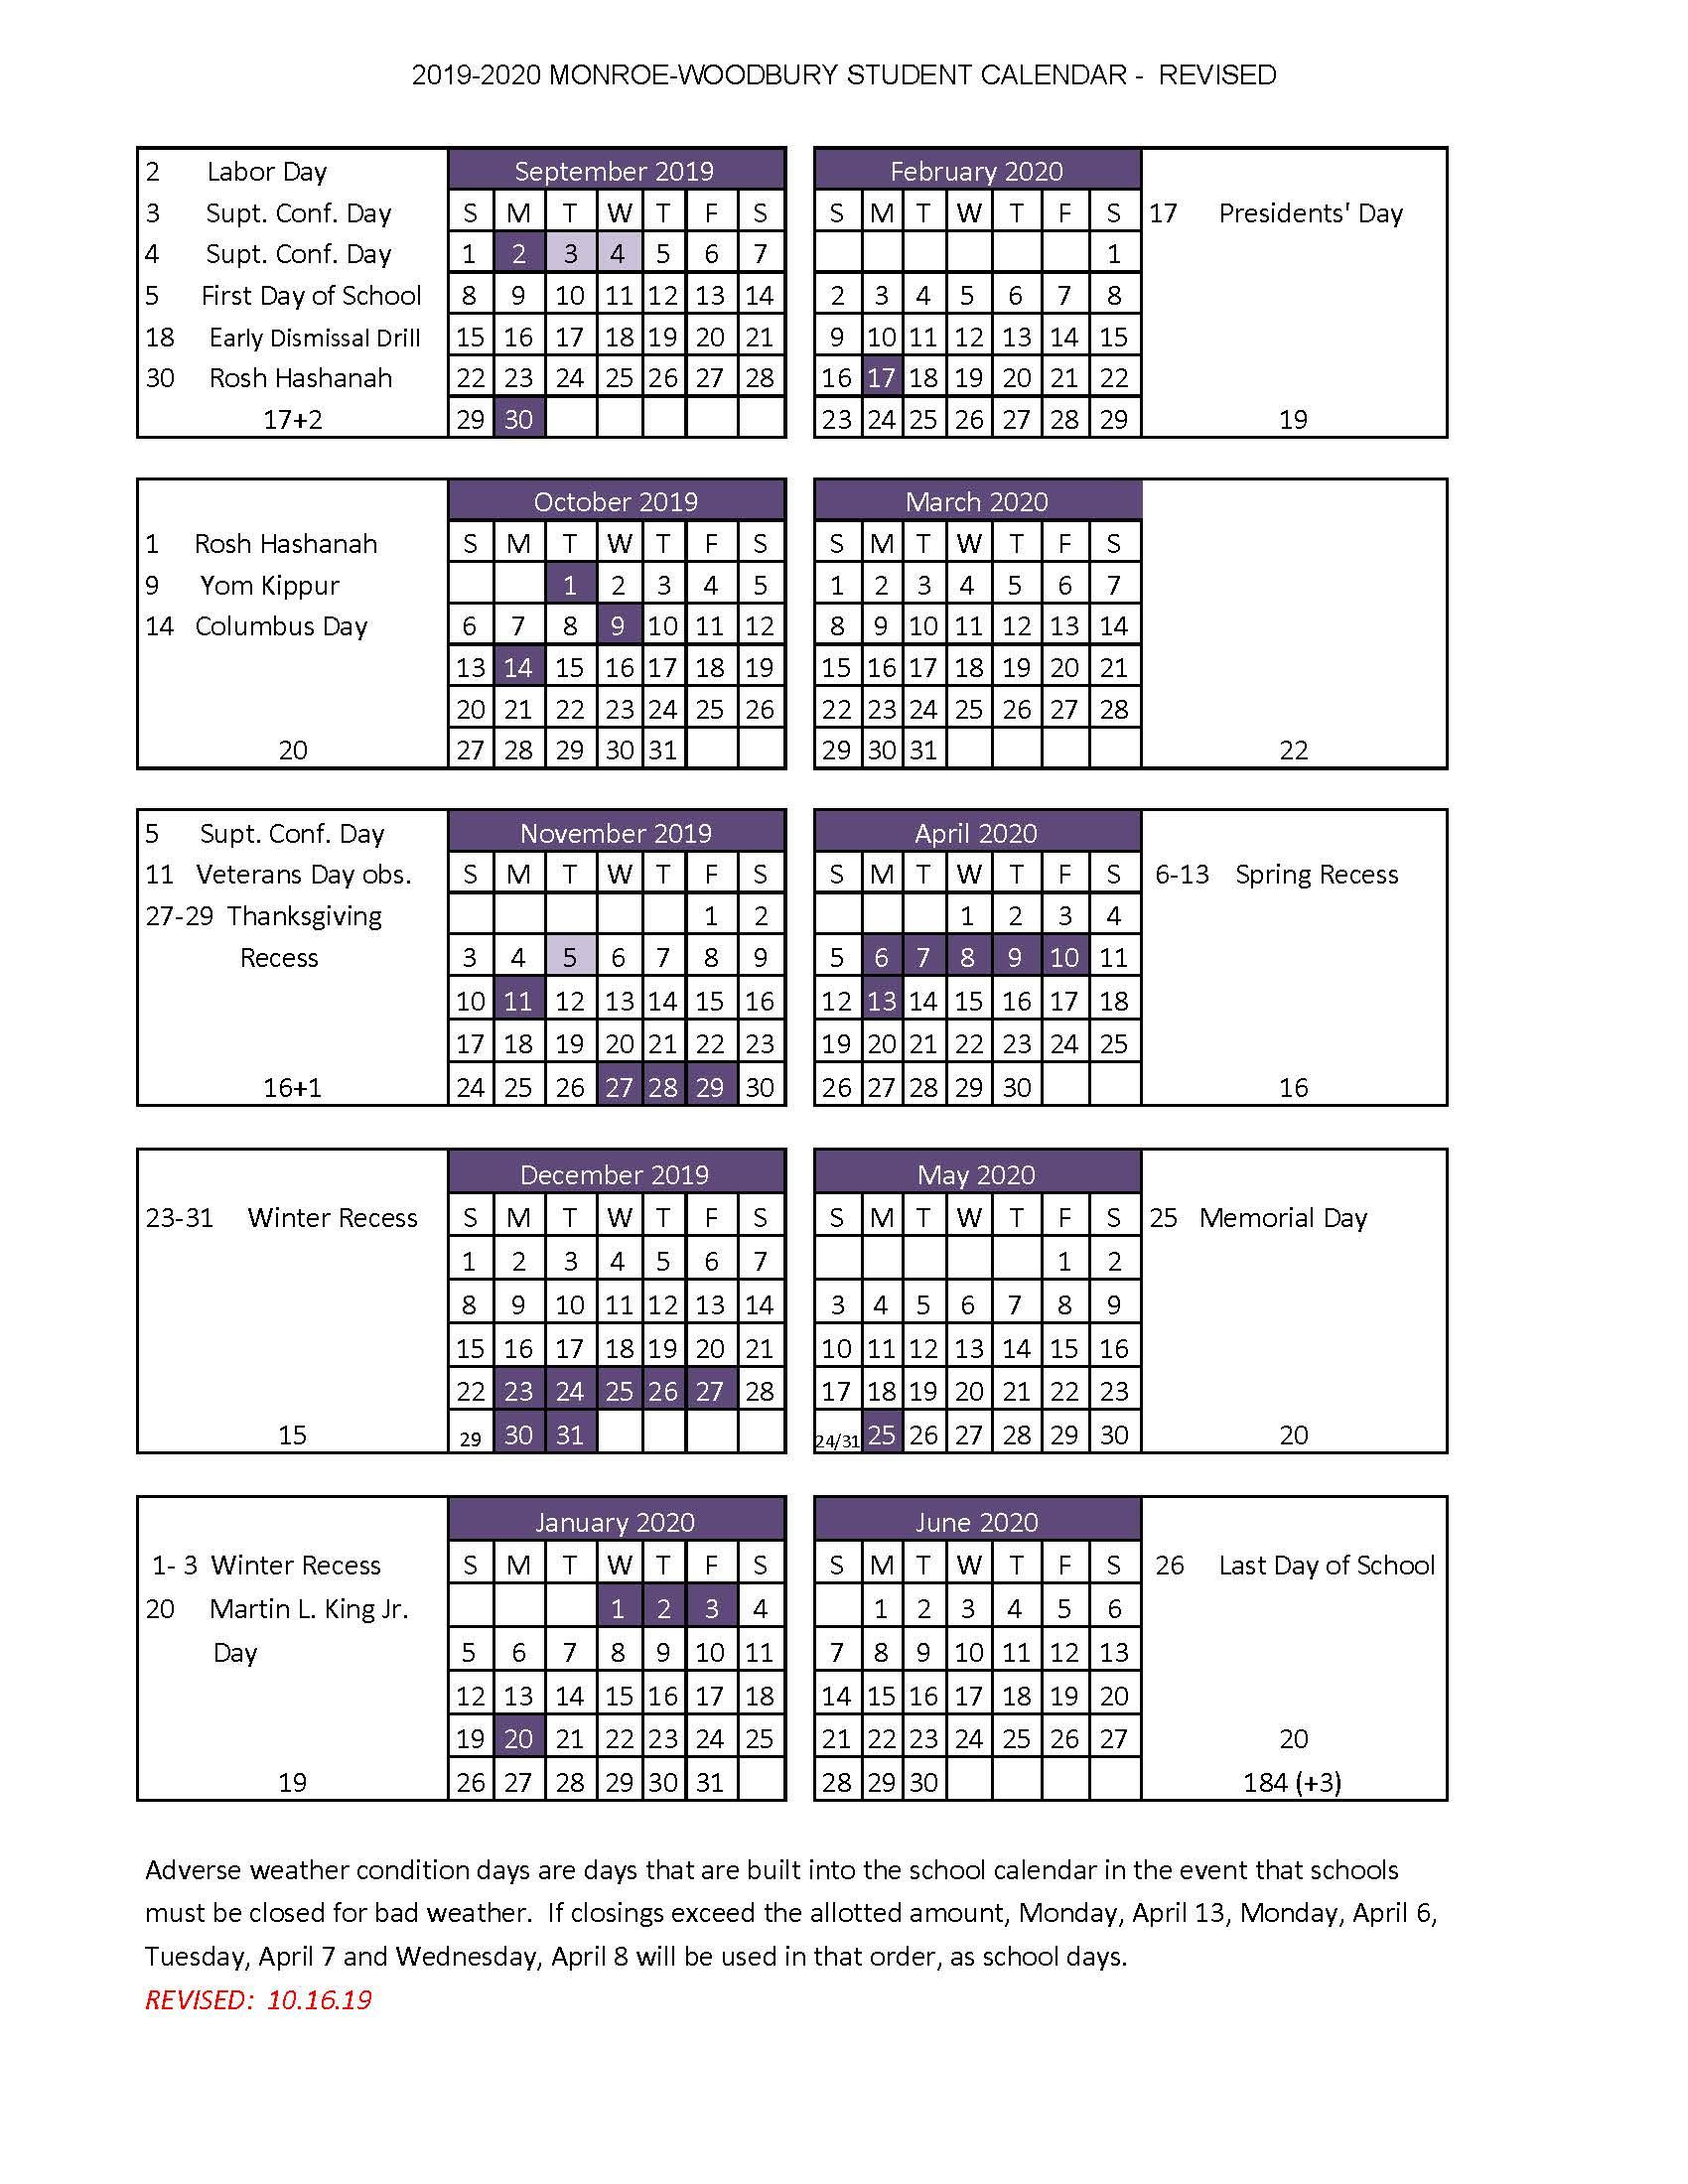 High School Handbook – Monroe Woodbury Central School With When Does School Start At College Of The Redwoods After Winter Break